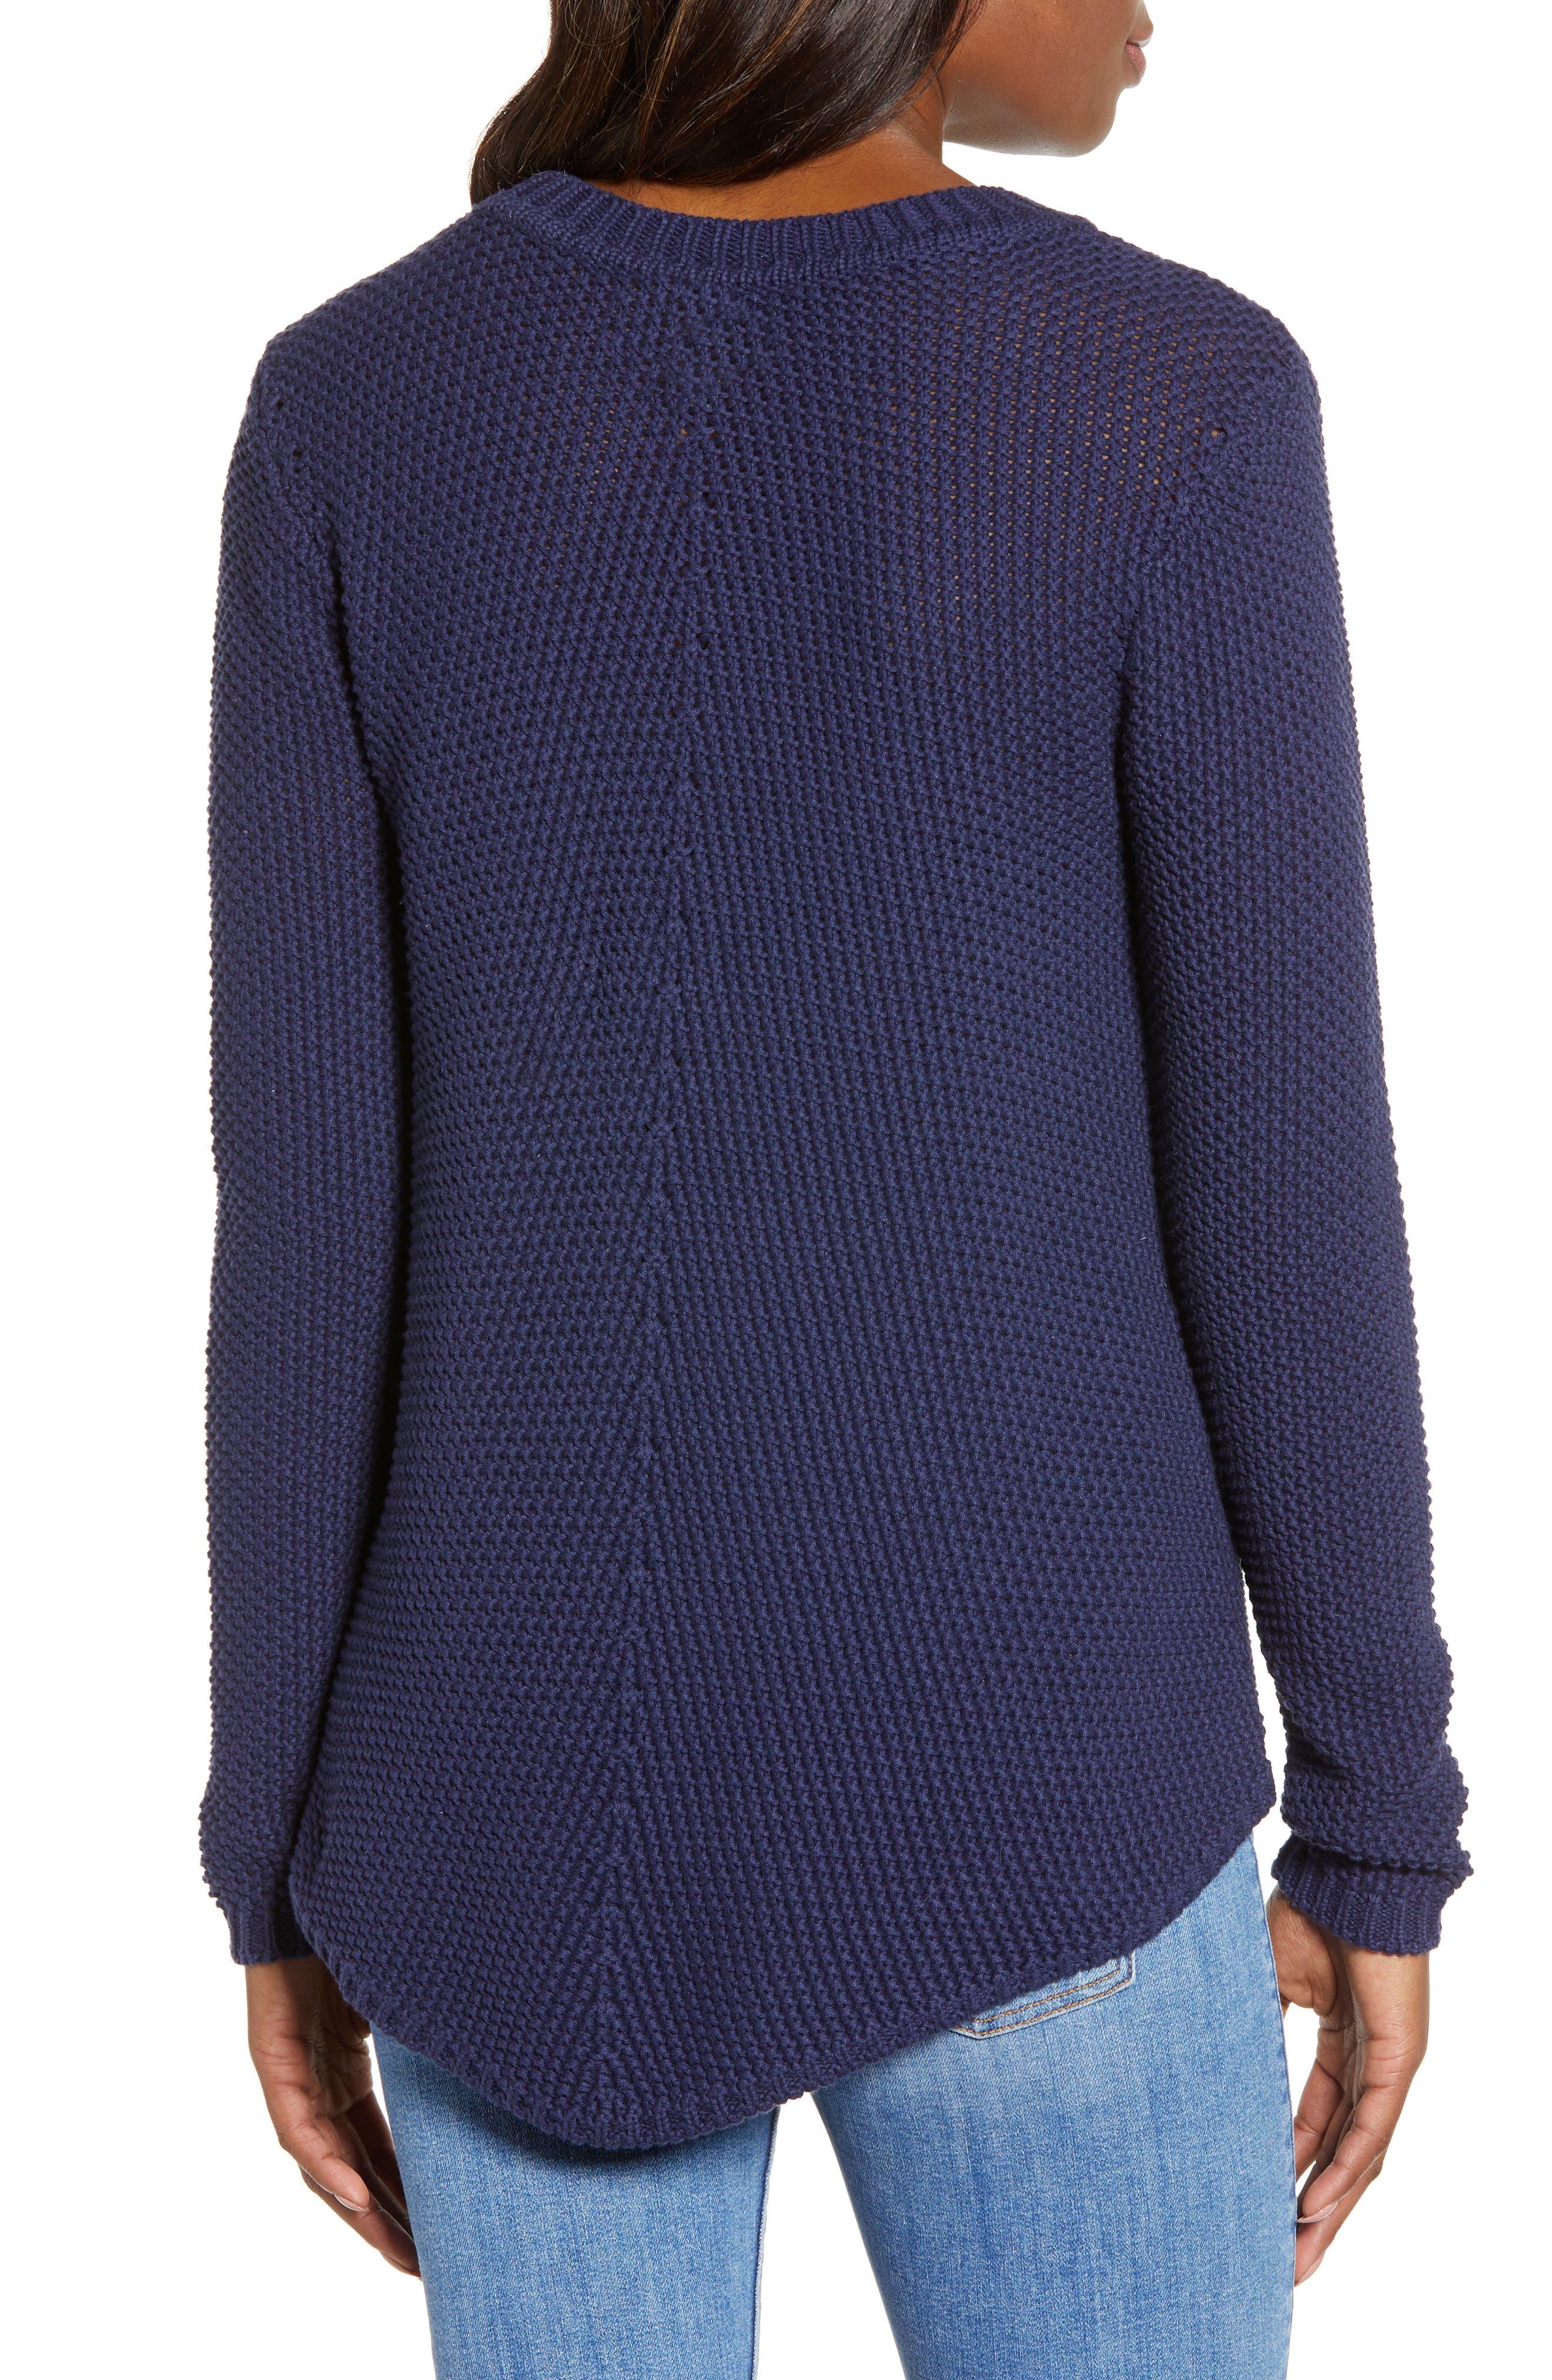 CASLON<SUP>®</SUP>, Stitch Stripe Sweater, Alternate thumbnail 2, color, NAVY PEACOAT